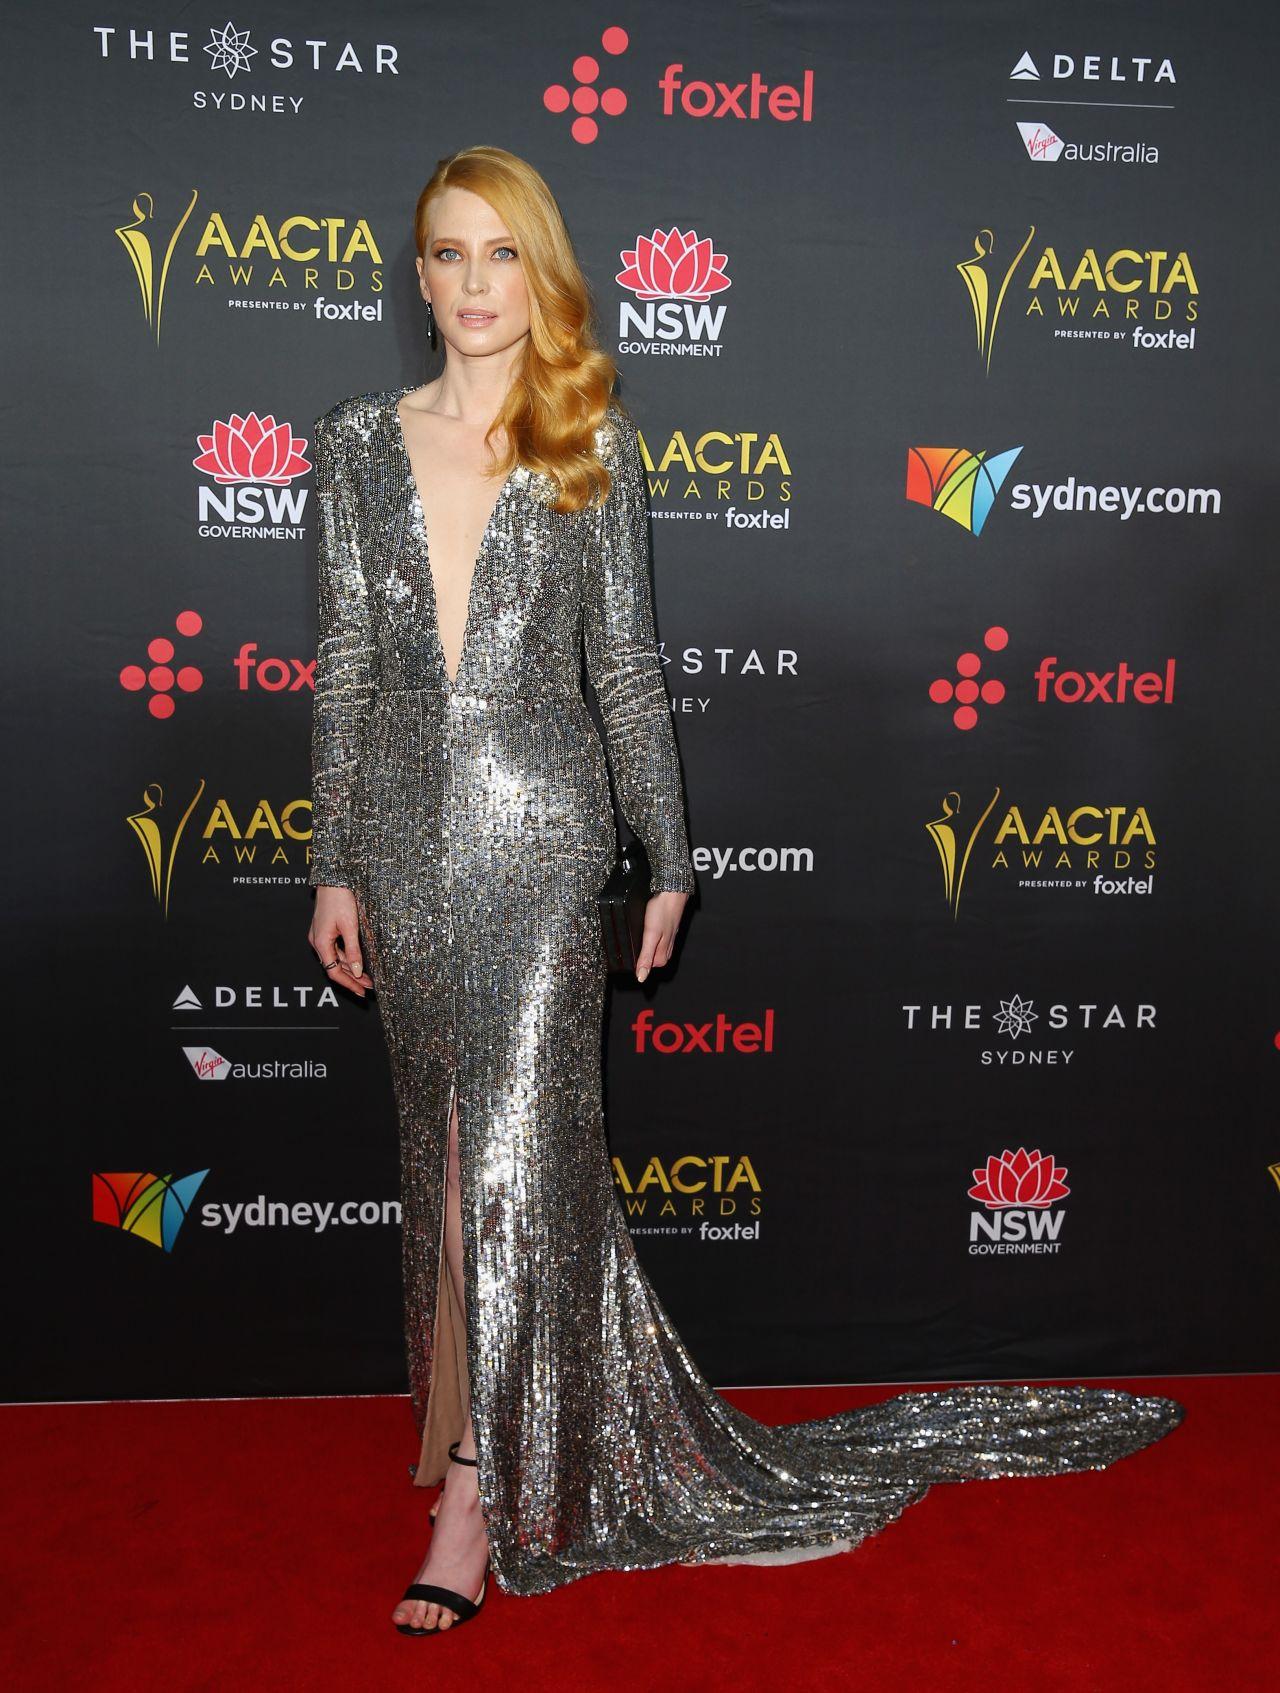 aacta awards - photo #34